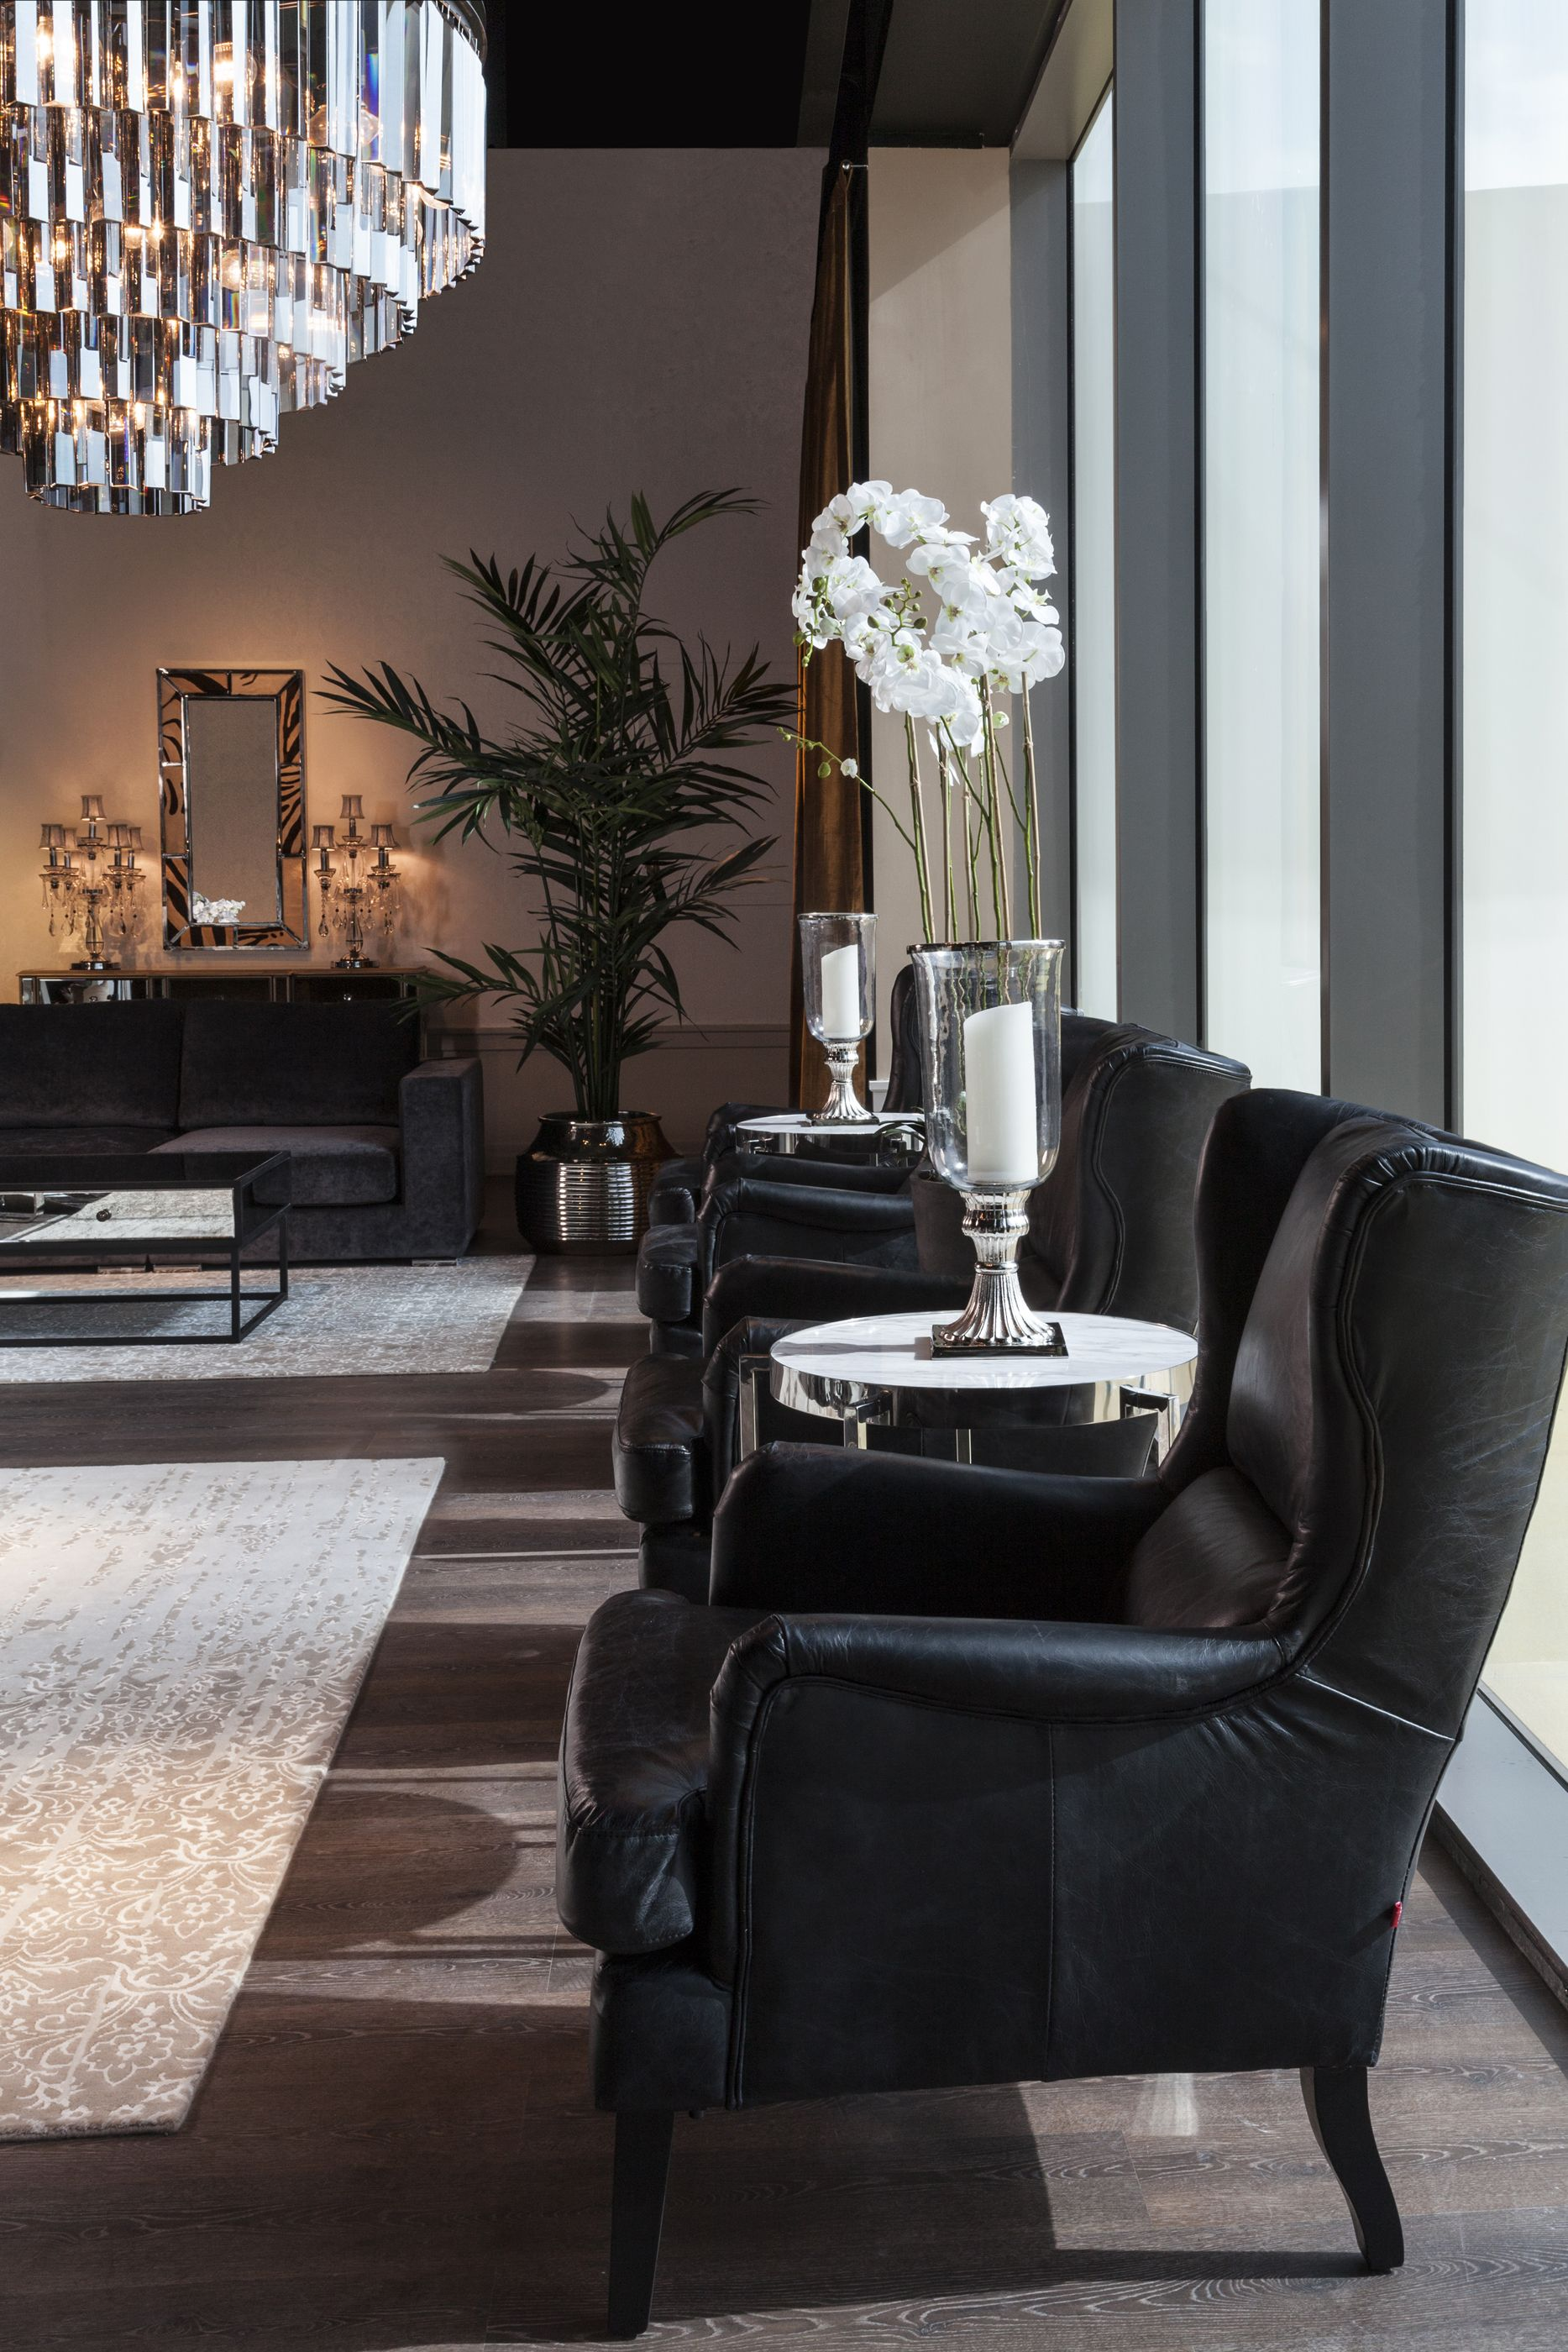 Living Rebeluxe Sleek Design Led Modern Classics Combine With Unexpected Statemen Luxury Furniture Living Room Contemporary Living Room Contemporary Living #sleek #modern #living #room